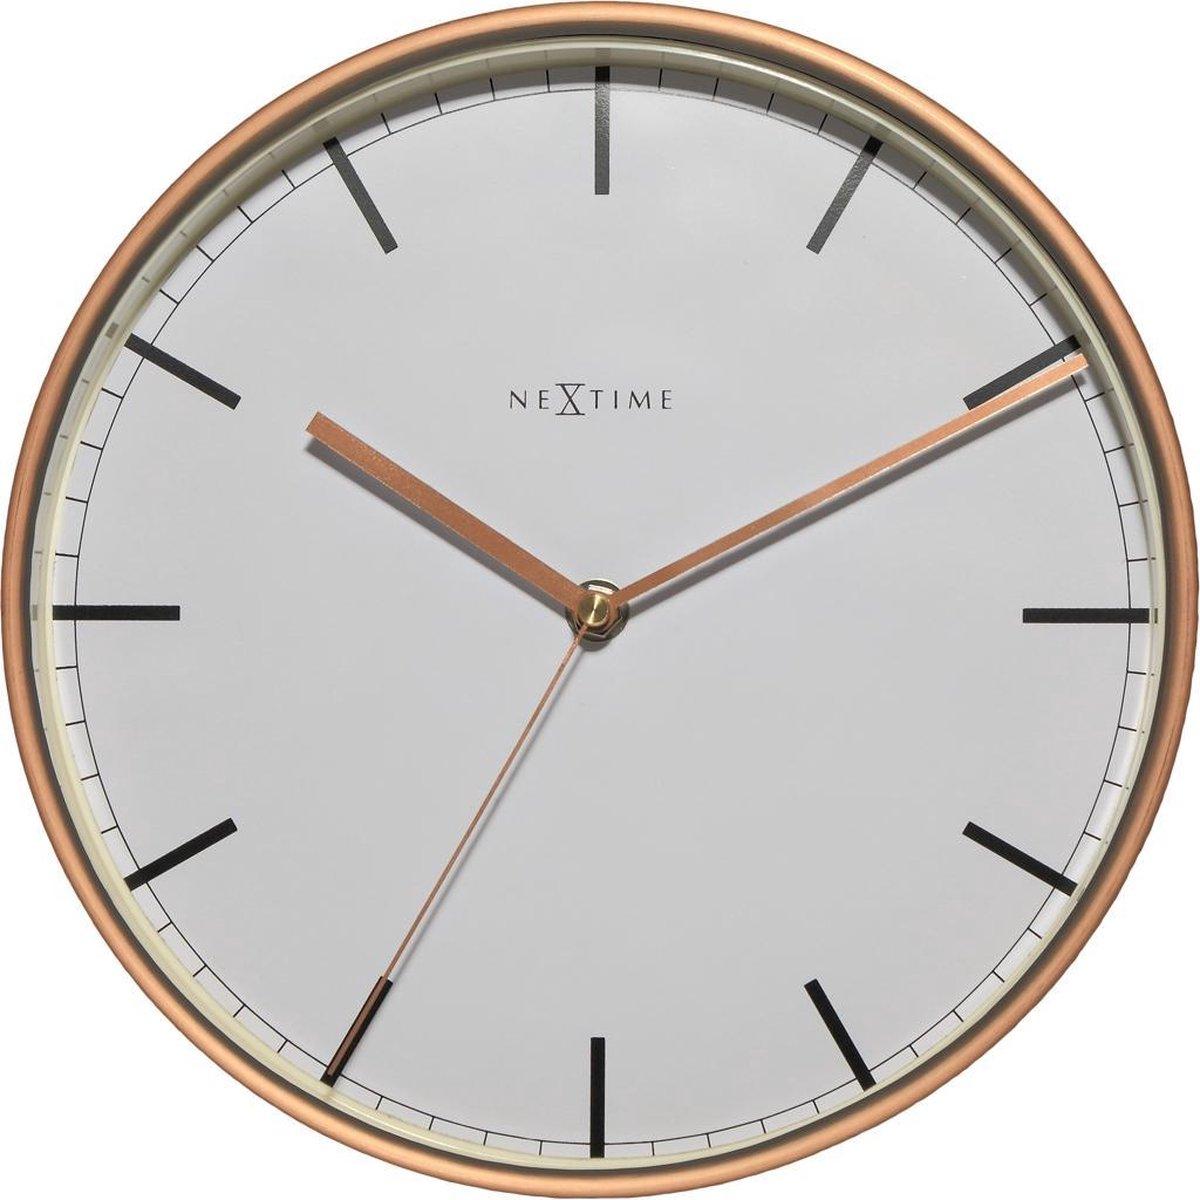 NeXtime Company Copper - Klok - Rond - Metaal / Glas - Ø30 cm - Wit/ Koperkleurig - NeXtime